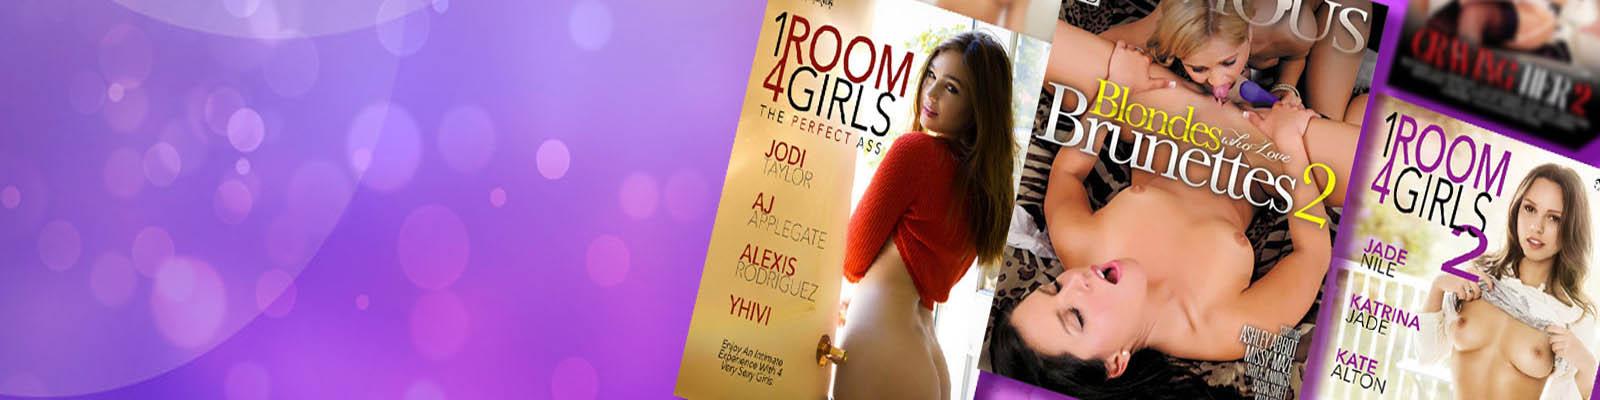 Lesbian Adult DVDs On Sale Now